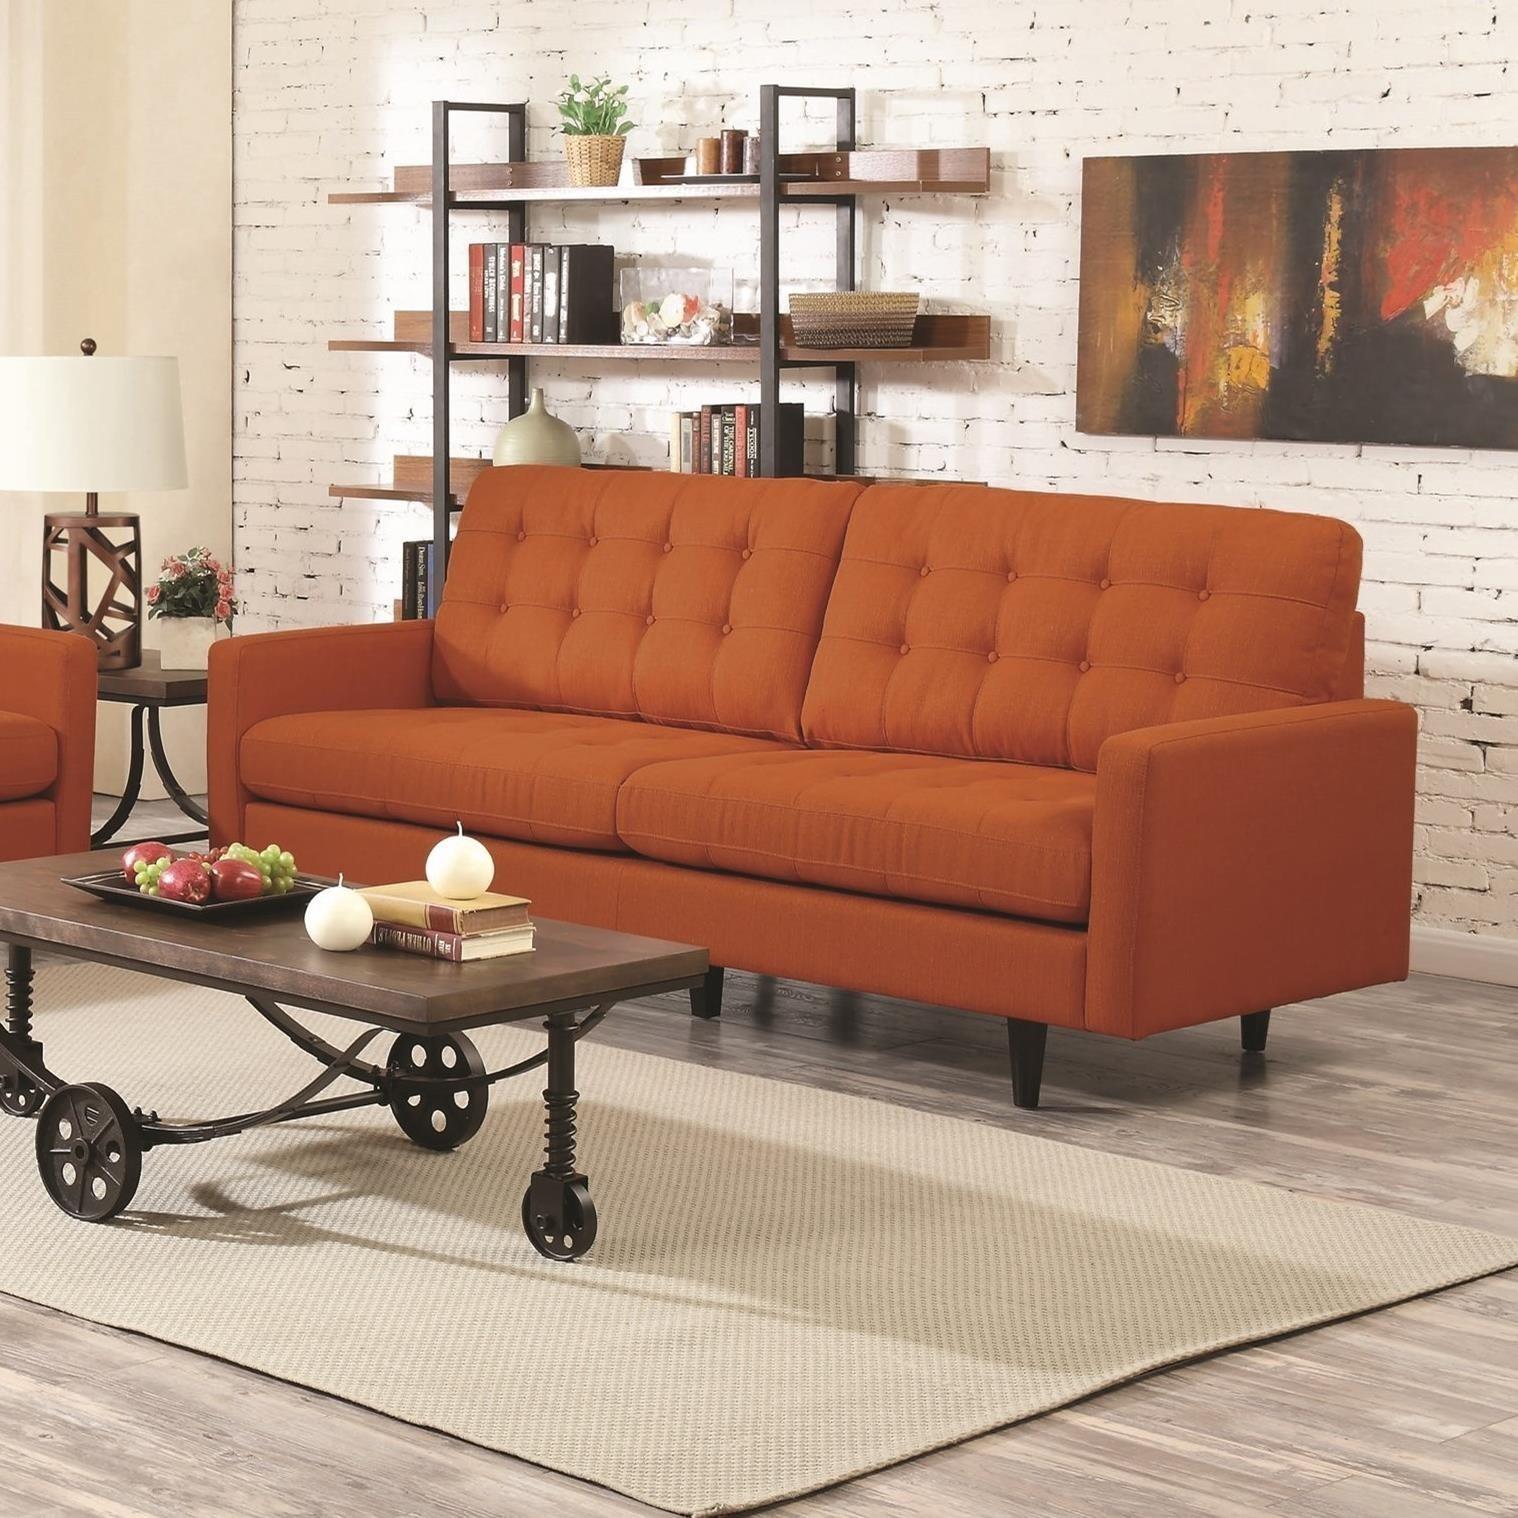 Coaster Kesson Mid Century Modern Sofa